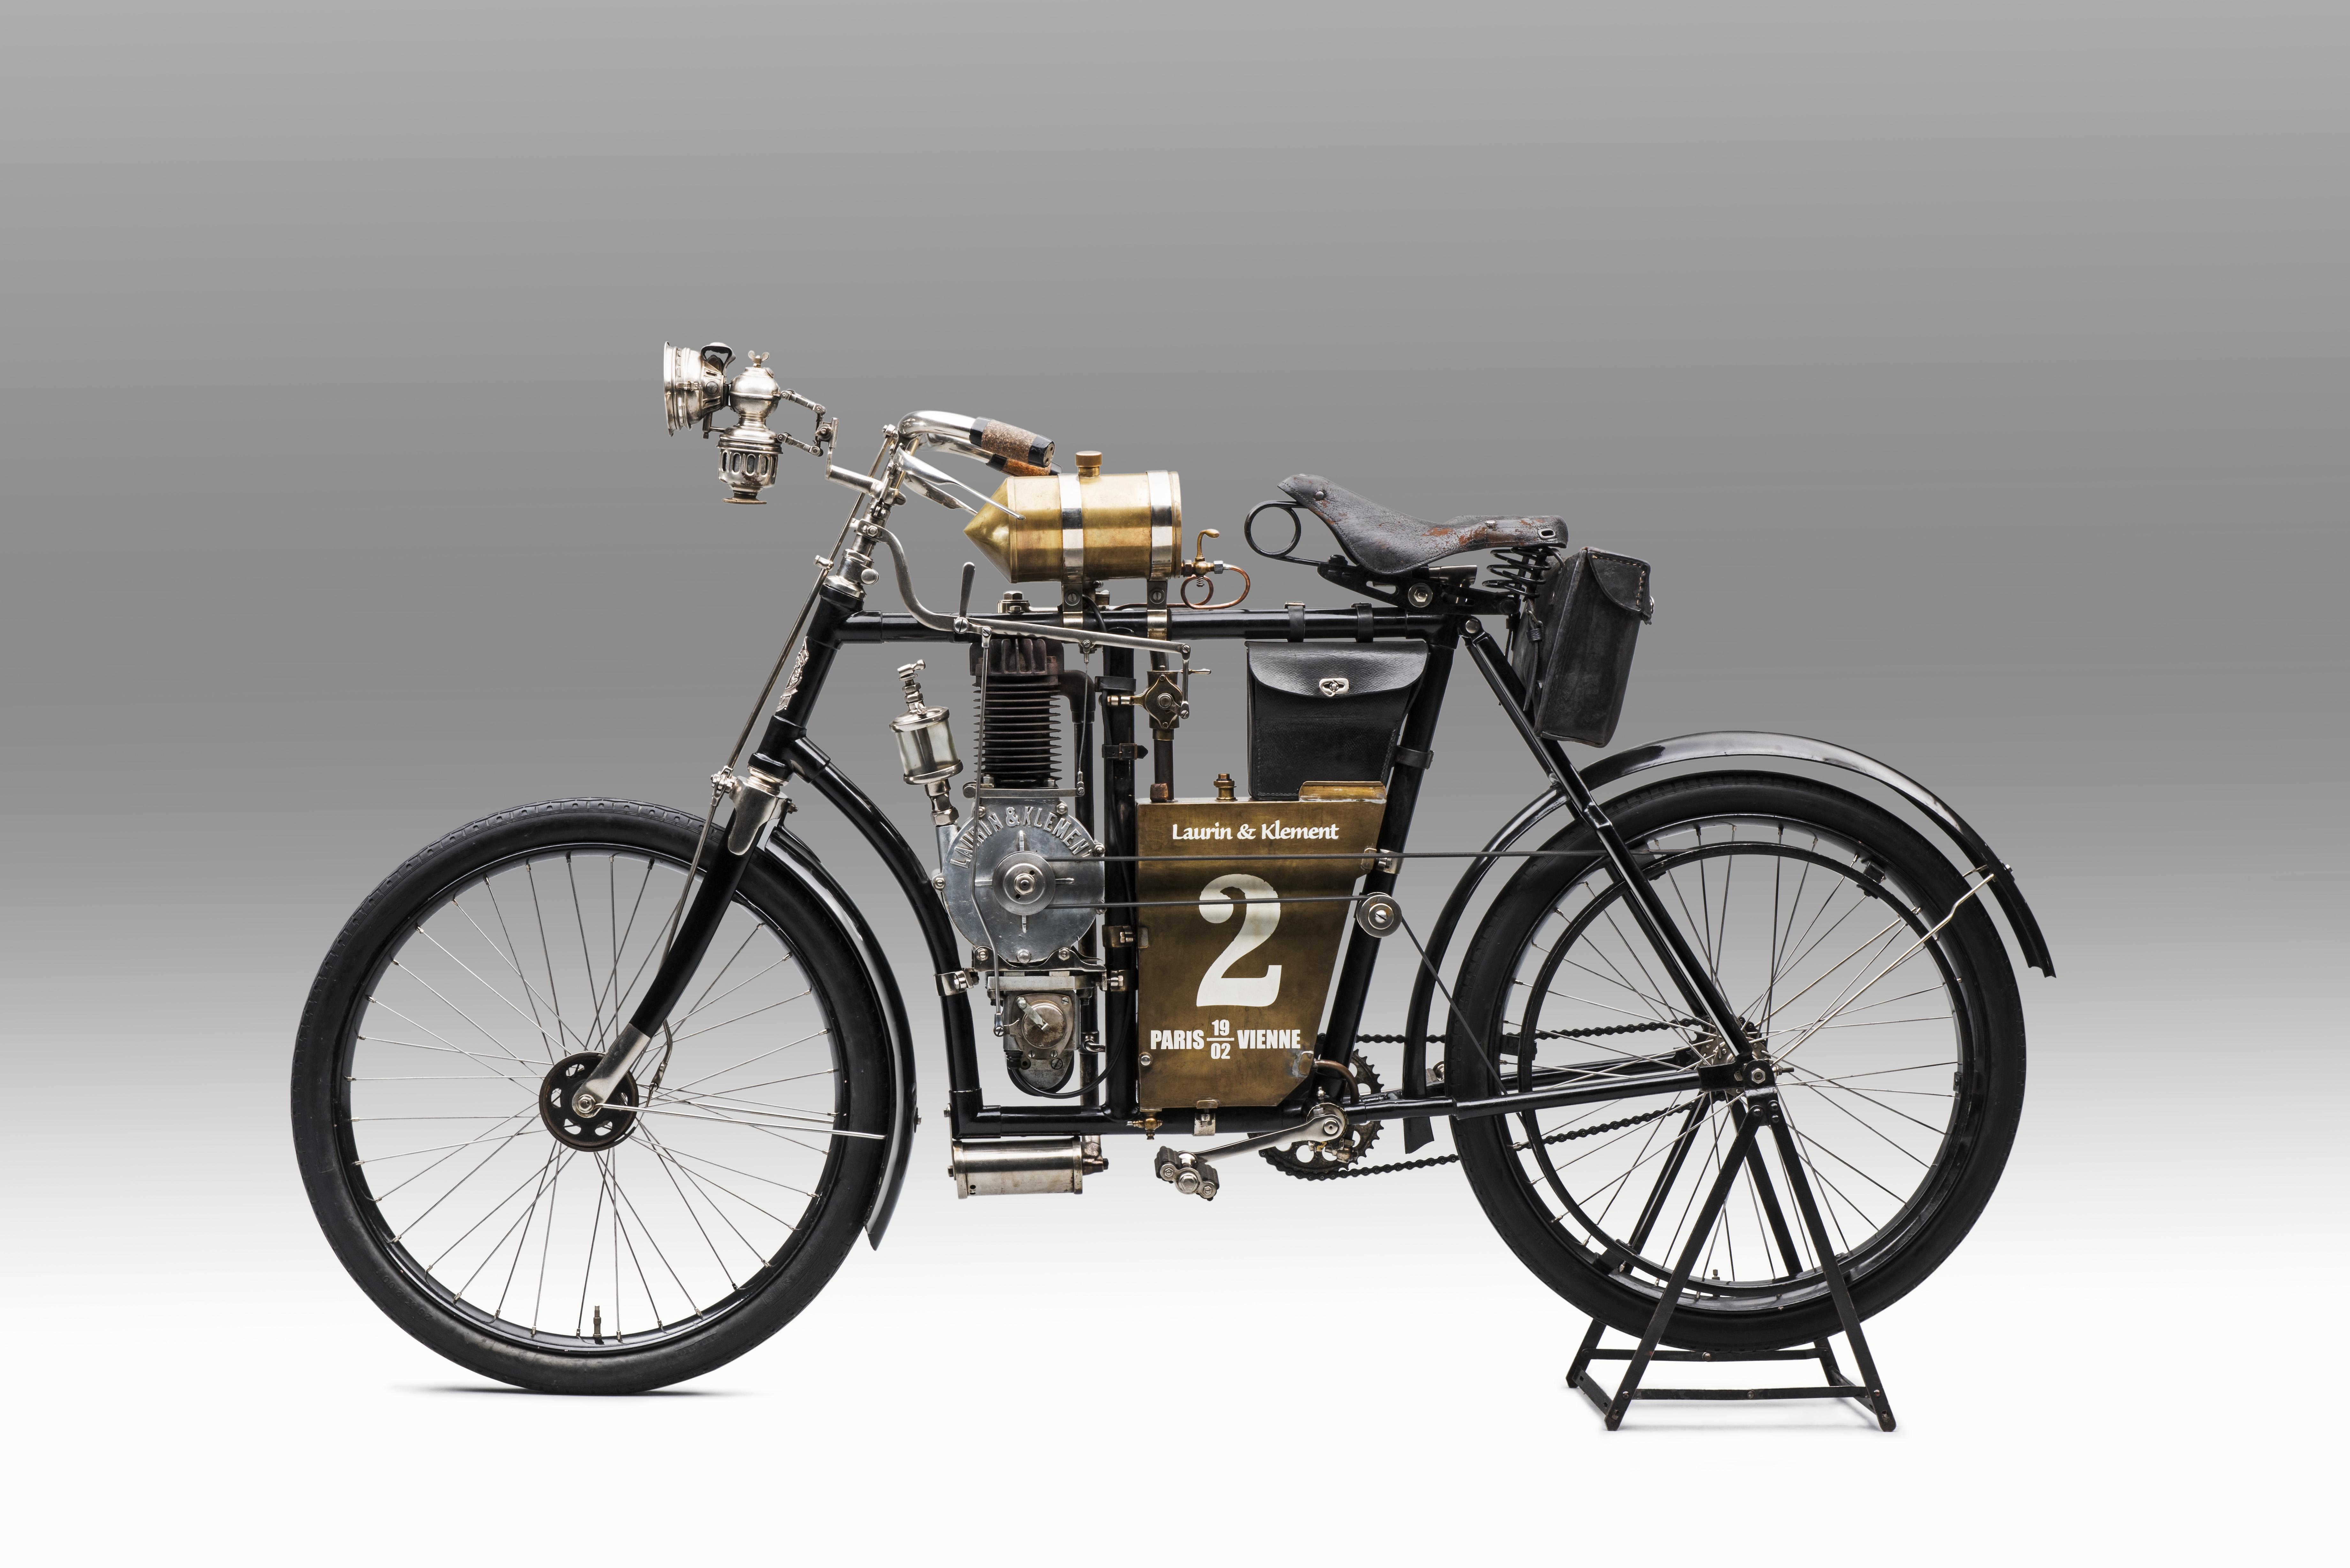 Laurin & Klement SLAVIA B: The history of SKODA Motorsport began 120 years ago between Paris and Berlin - Image 5